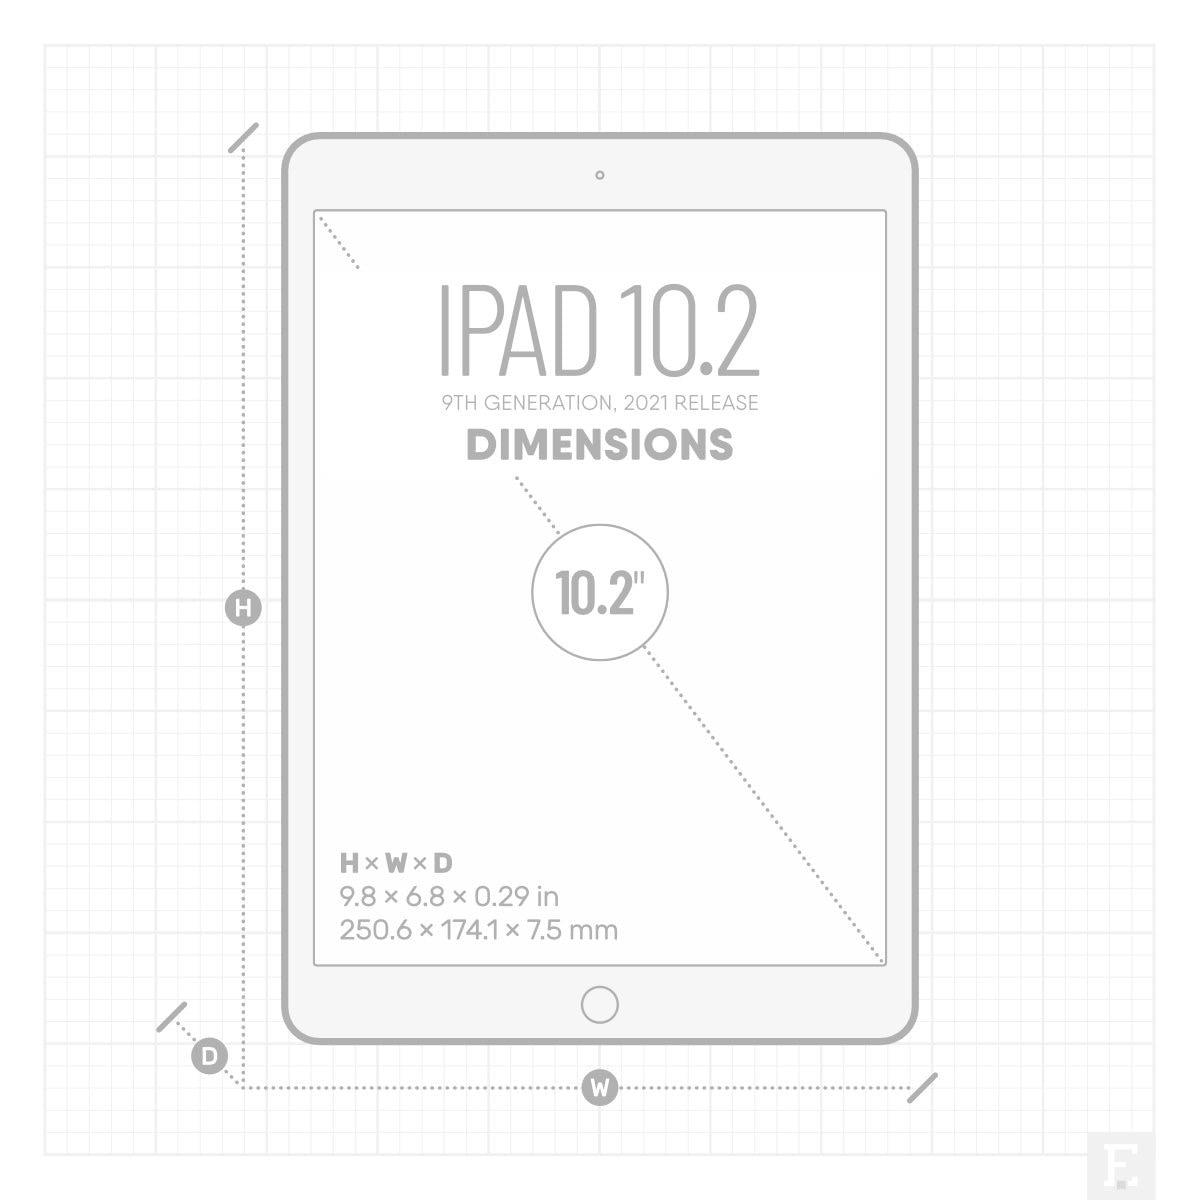 Apple iPad 10.2 2021 dimensions screen size